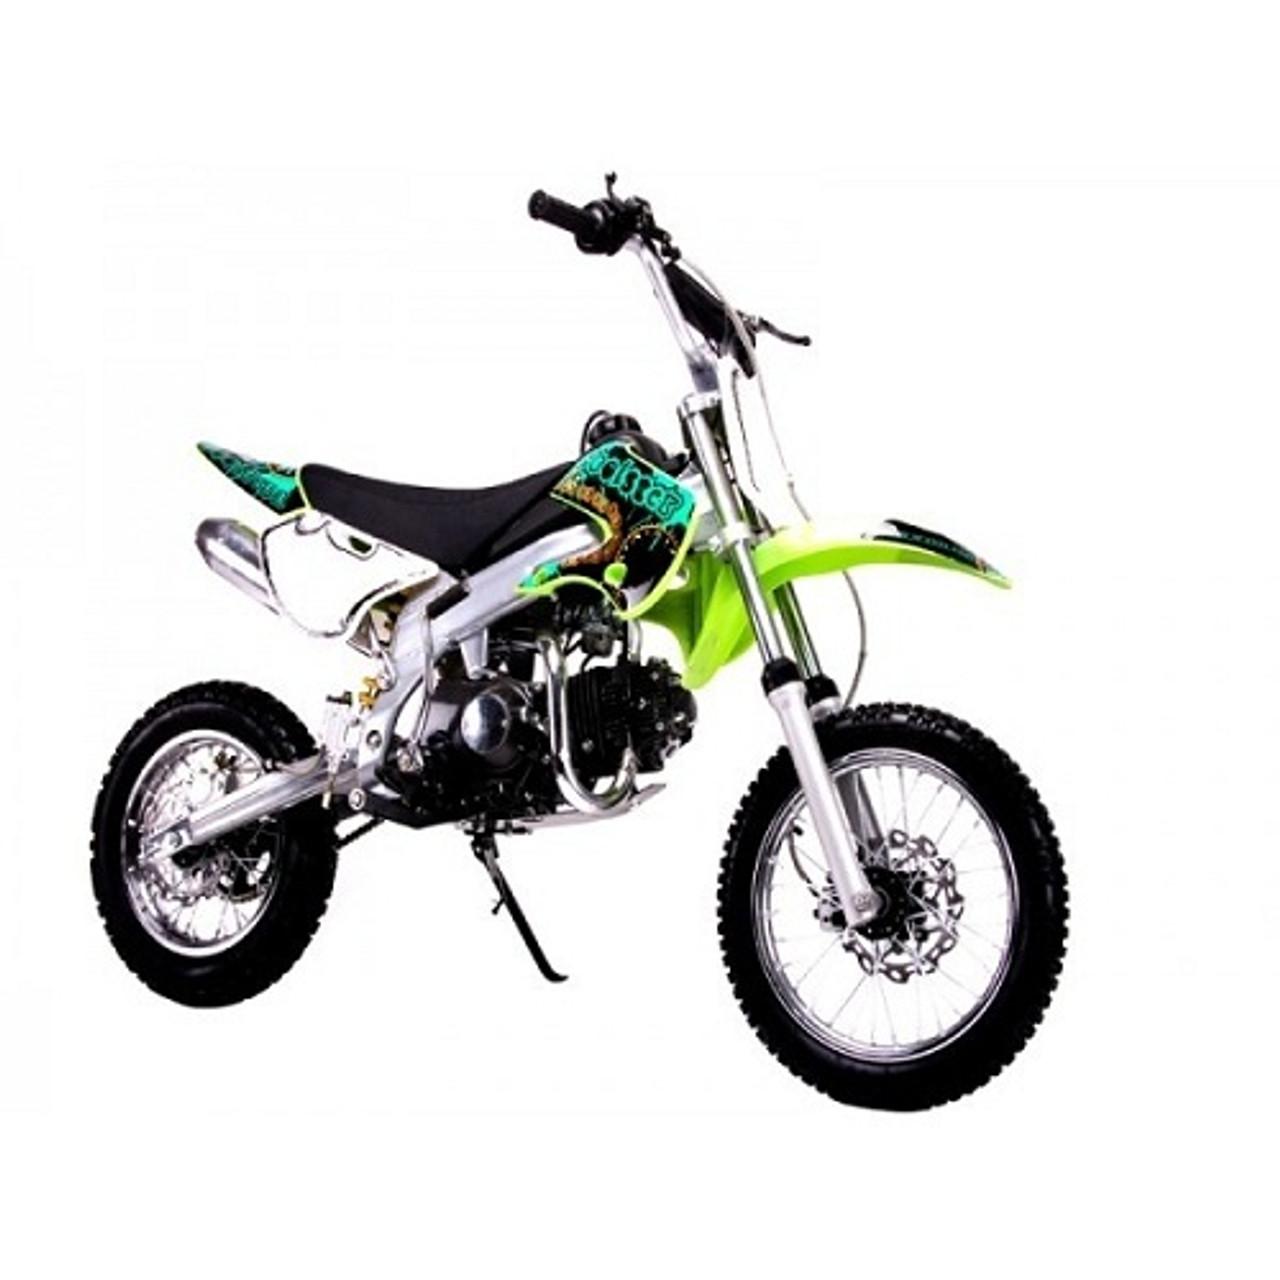 Coolster 125cc Manual Clutch Mid Size Dirt Bike - QG-214FC